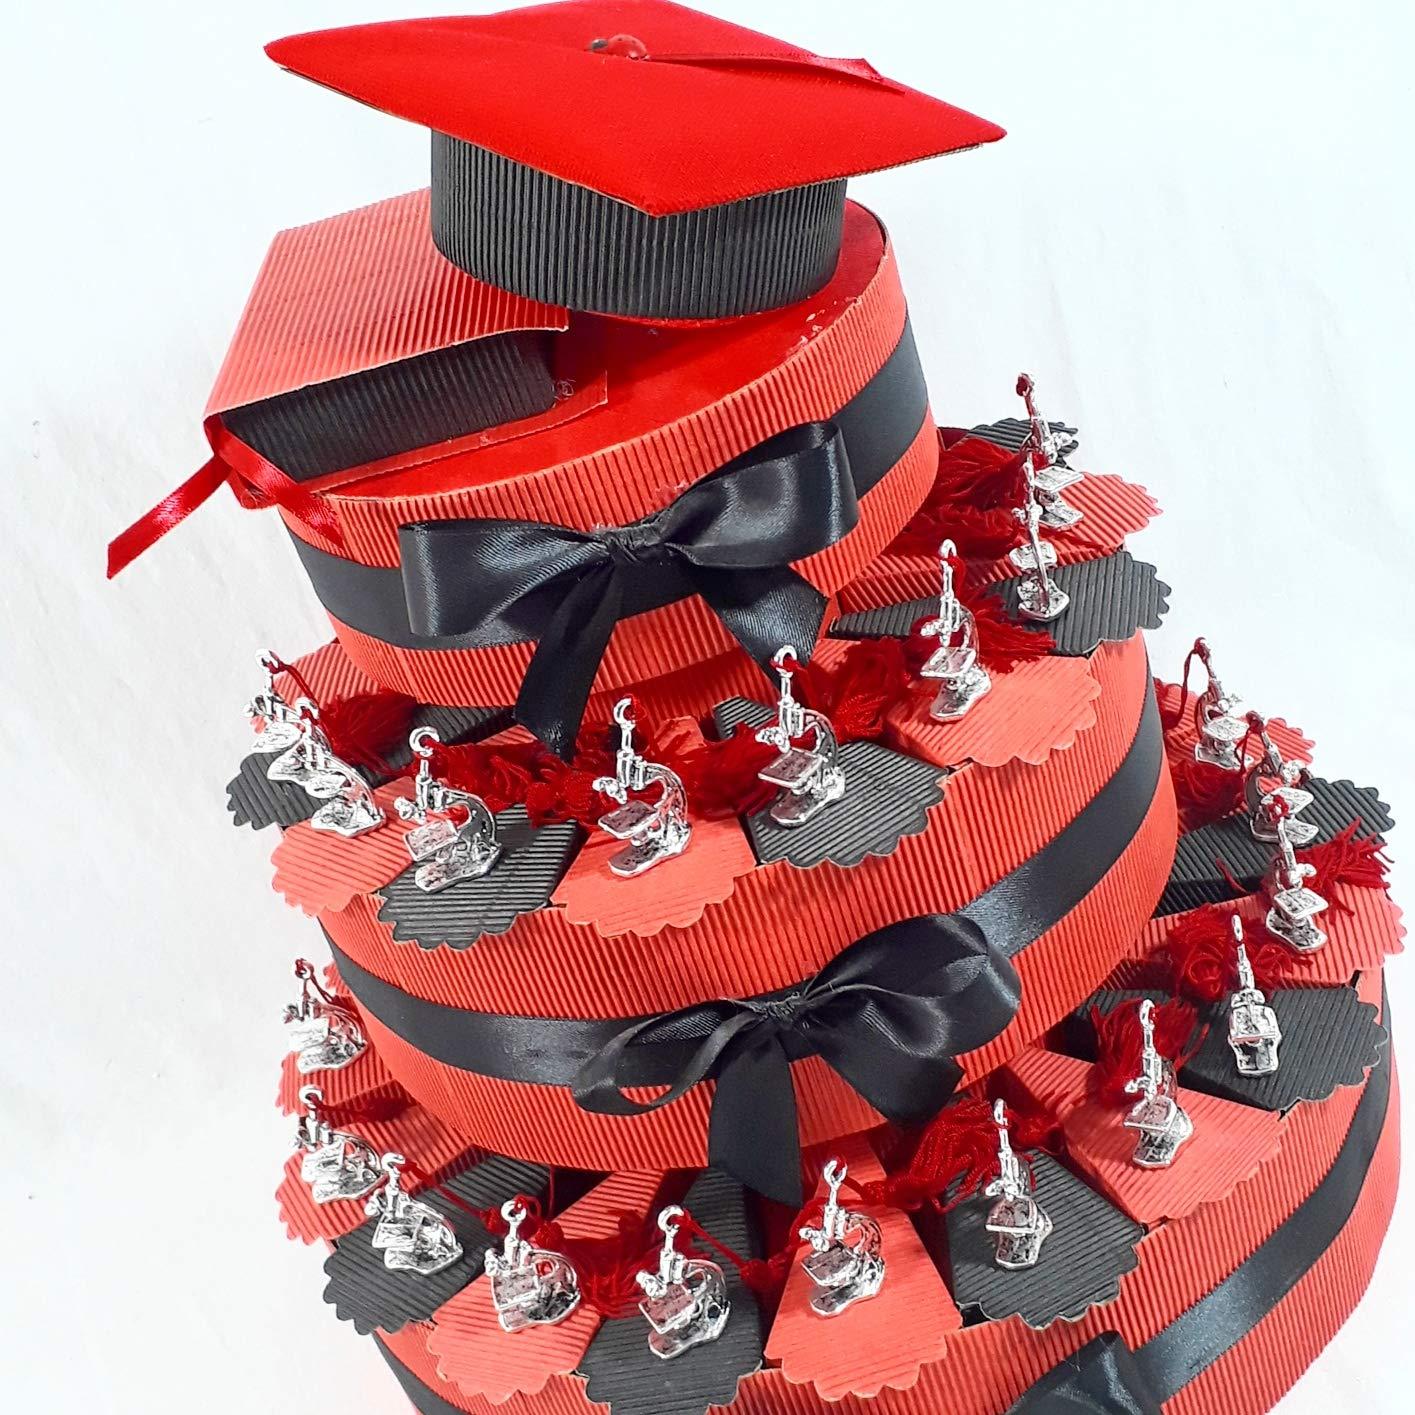 40% de descuento Torta Da 60 Fette Fette Fette Tarta BOMBONIERA Microscopio Plata con Madison para graduación Biología Scienze Tocco terciopelo  tiempo libre